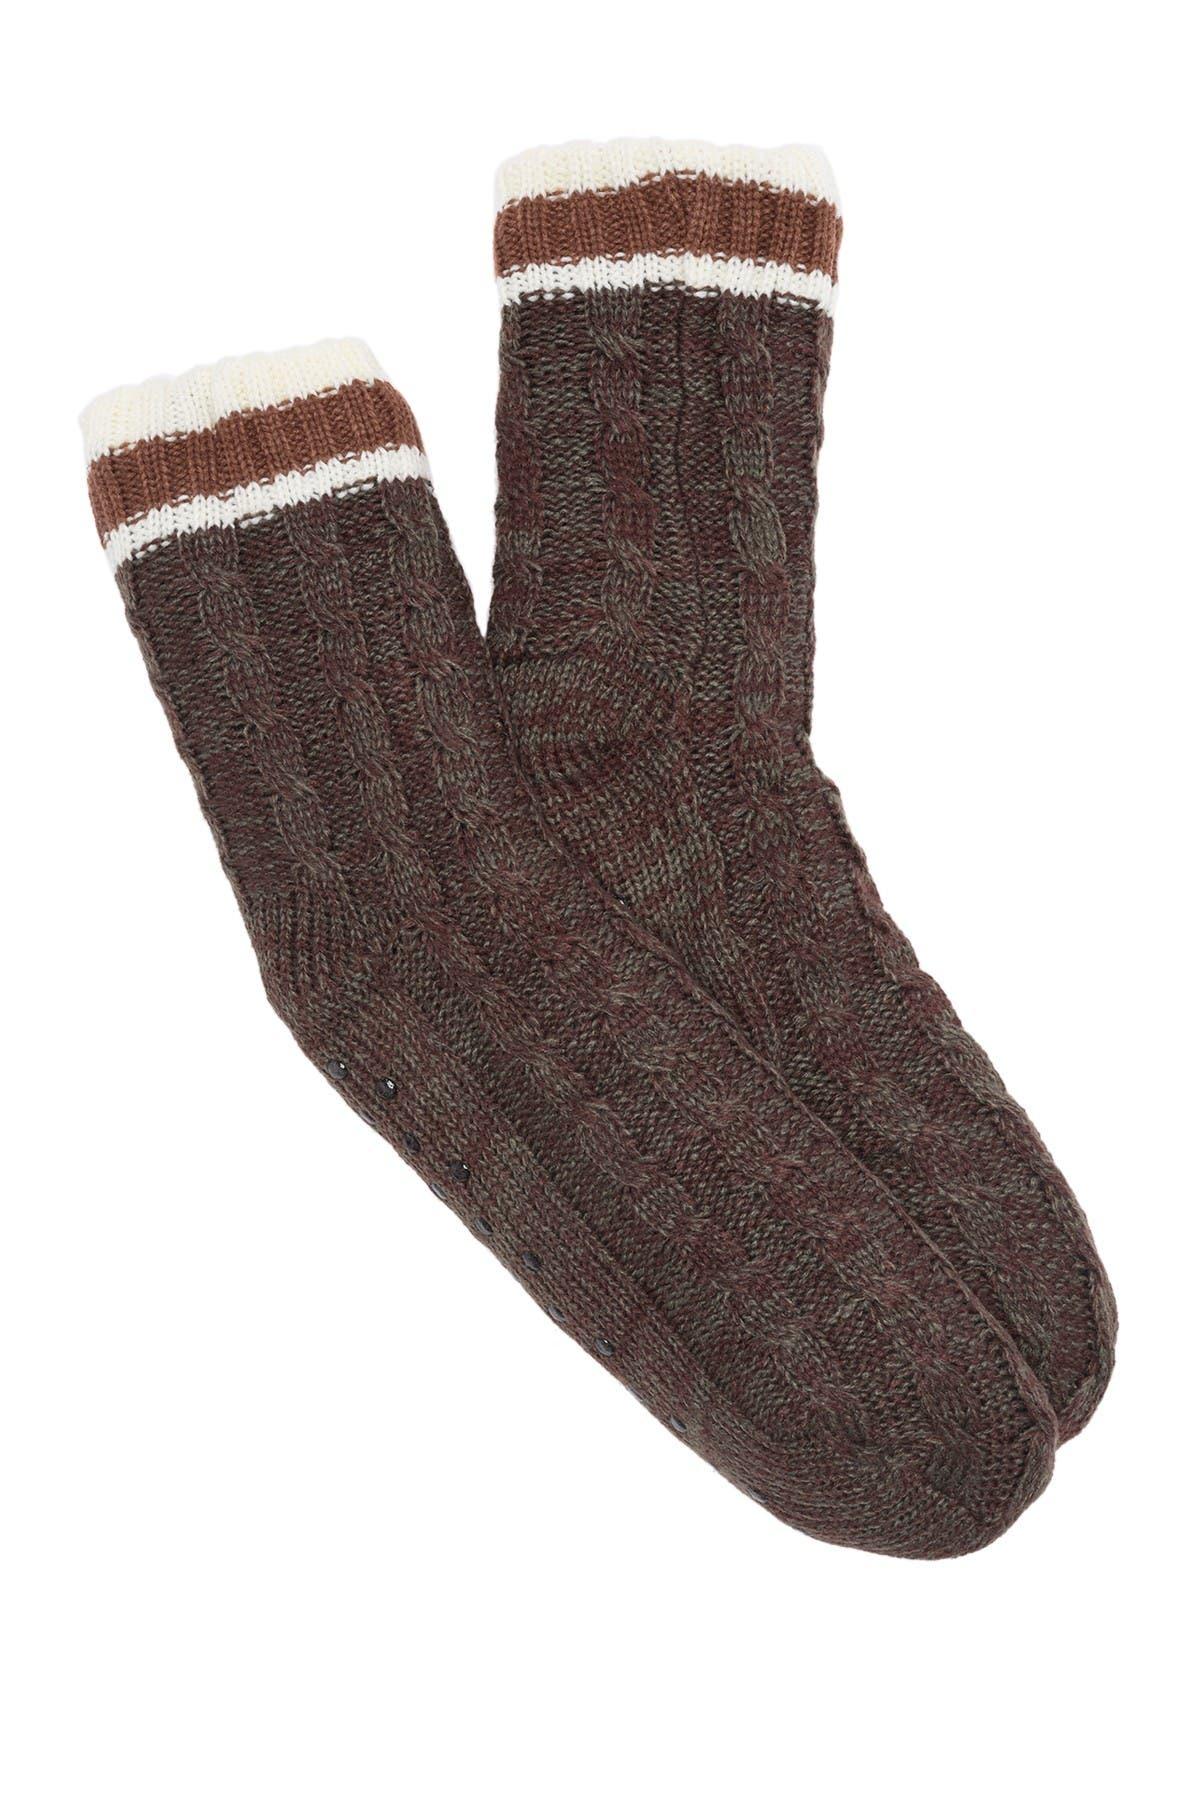 Image of Woolrich John Rich & Bros Cable Knit Fleece Lined Slipper Socks